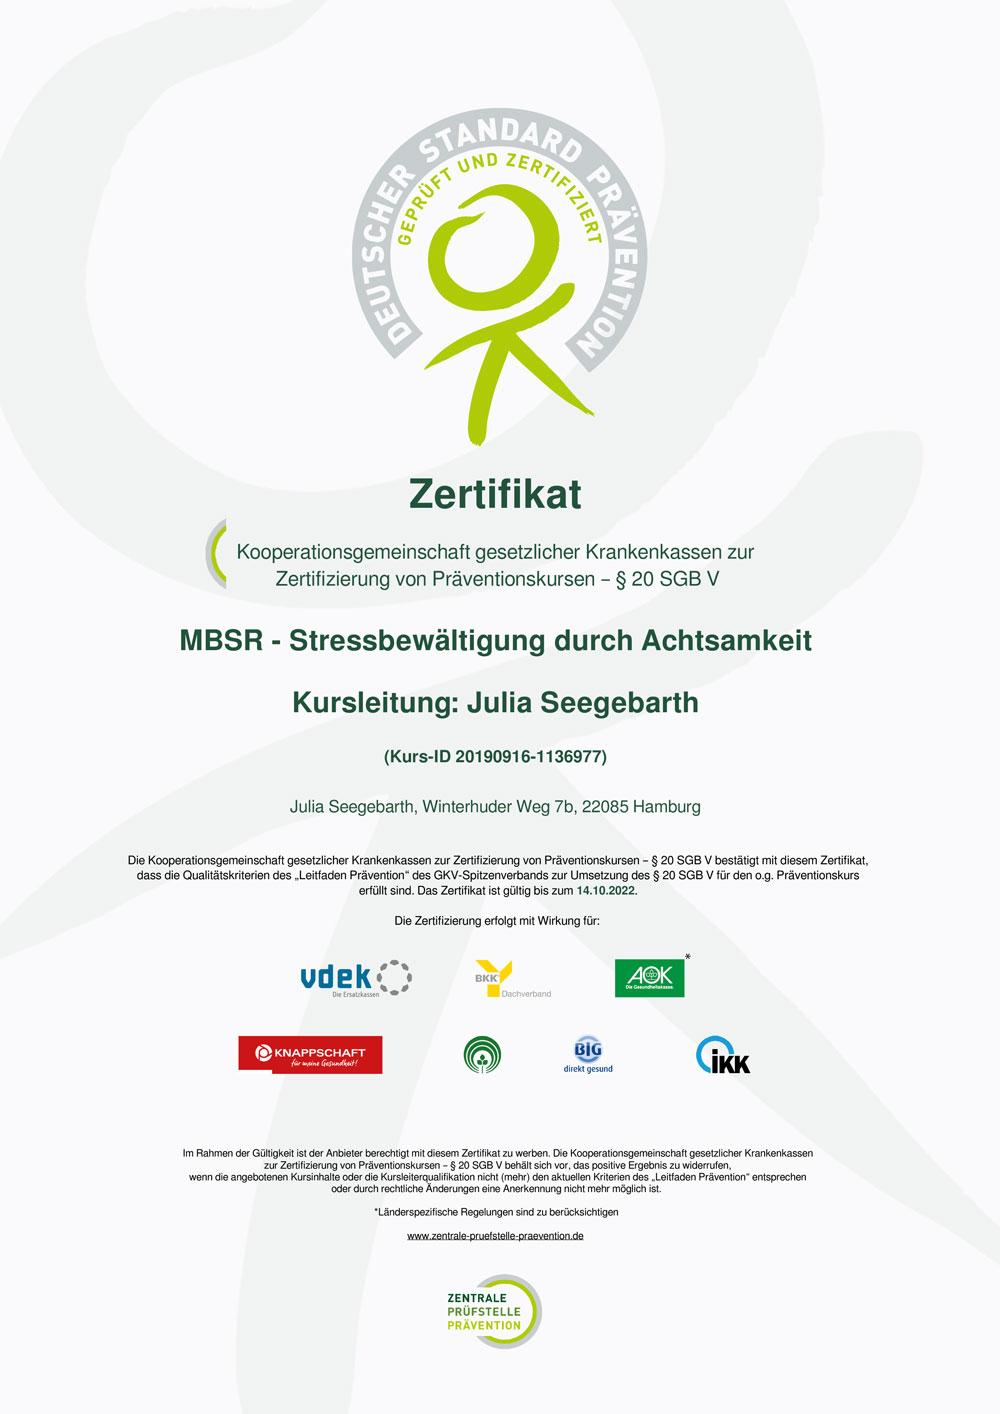 Zertifikat – Deutscher Standard Prävention